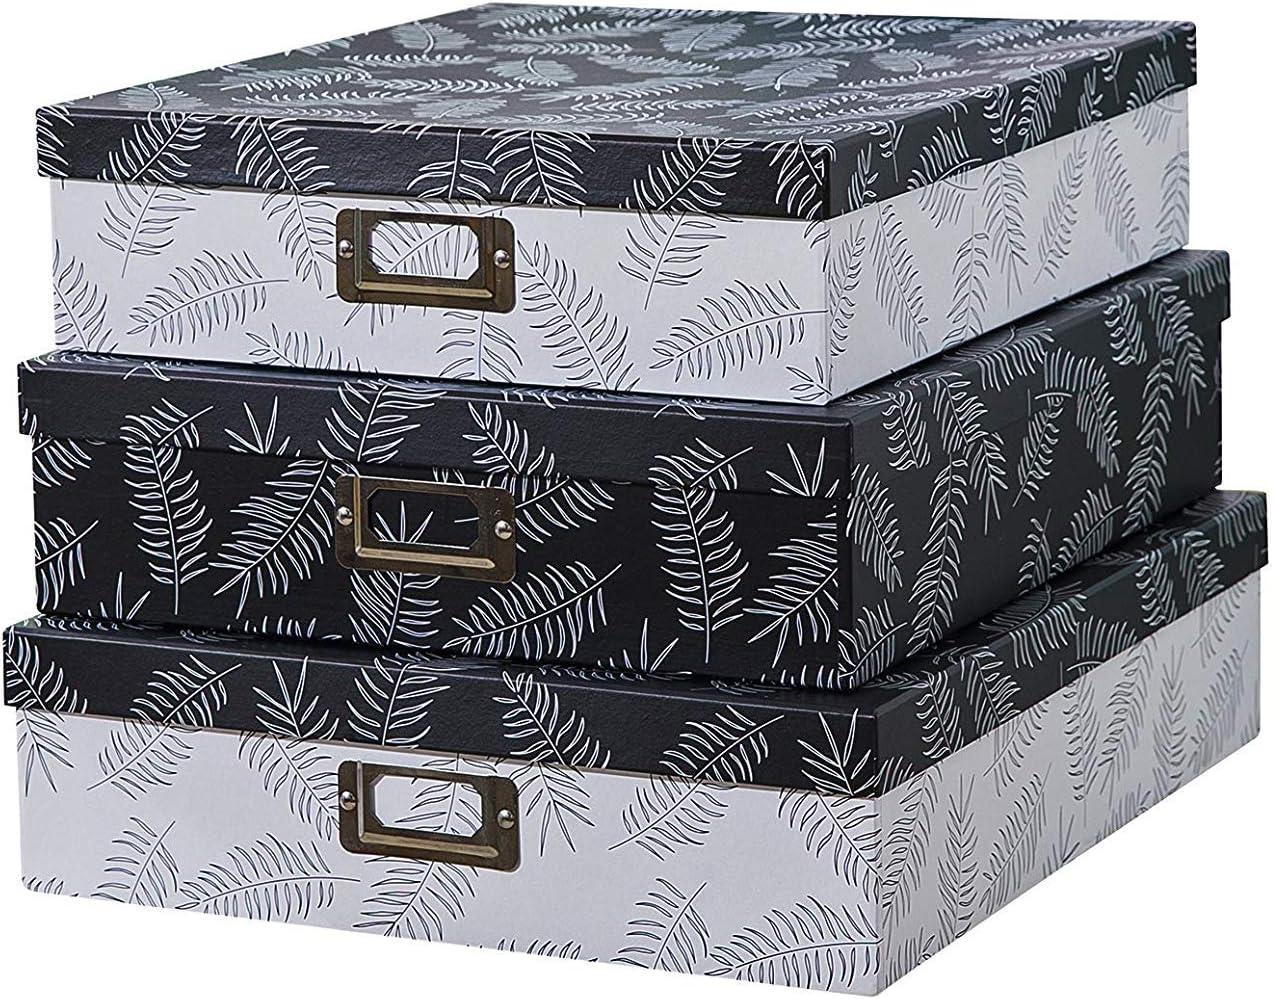 Blue Koop Cardboard Large 45L Storage Boxes With Lids Christmas Storage Box Baubles Design